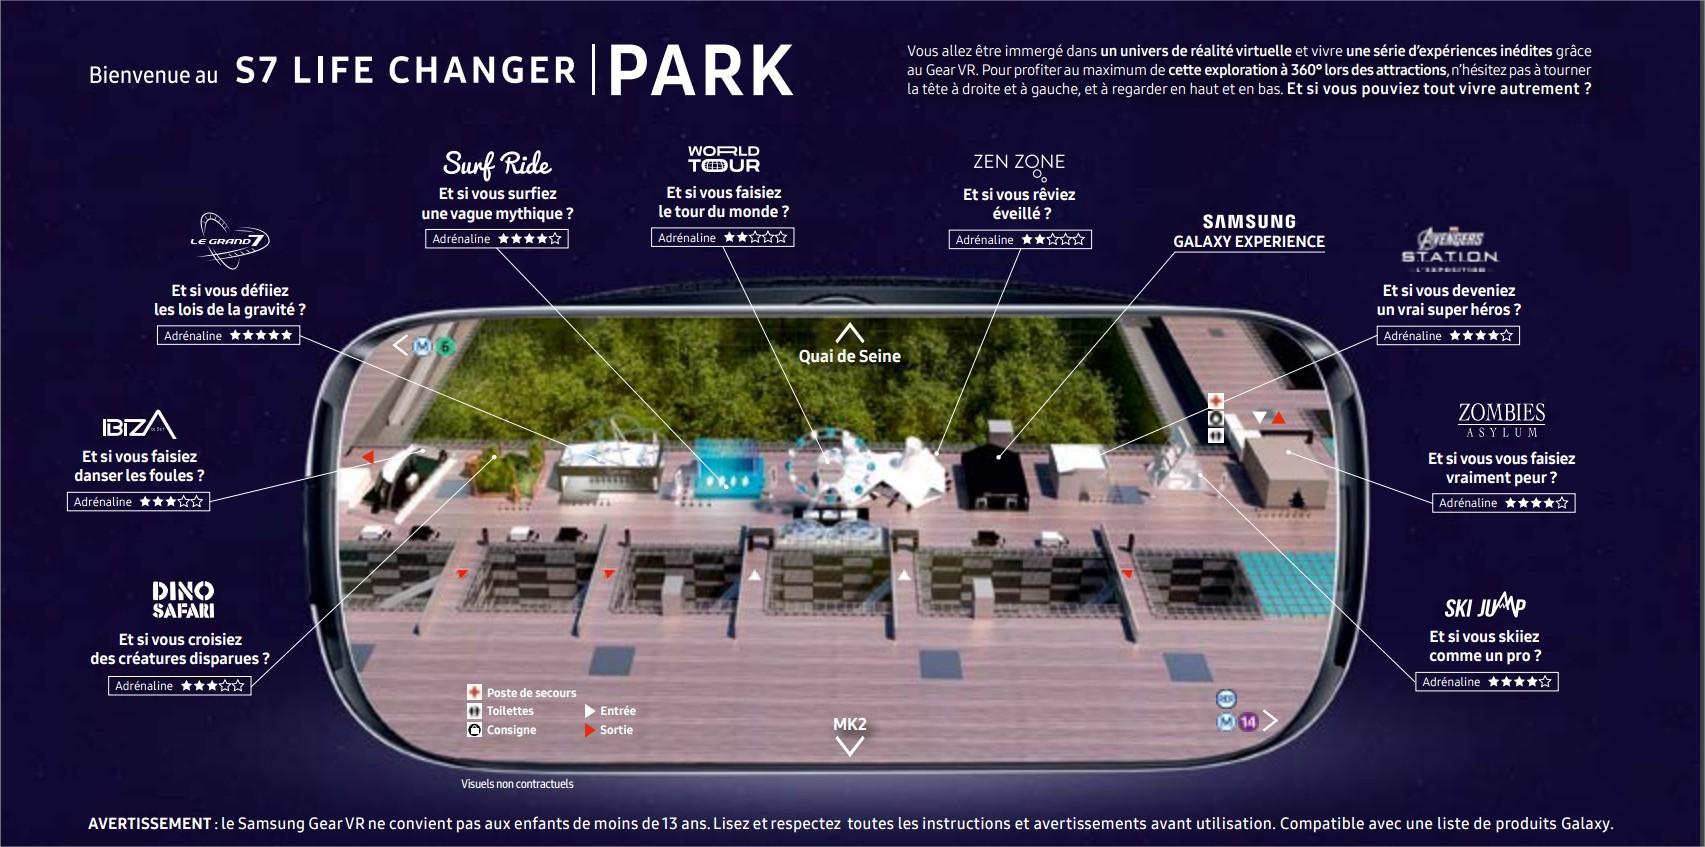 plan_s7lifechanger_park